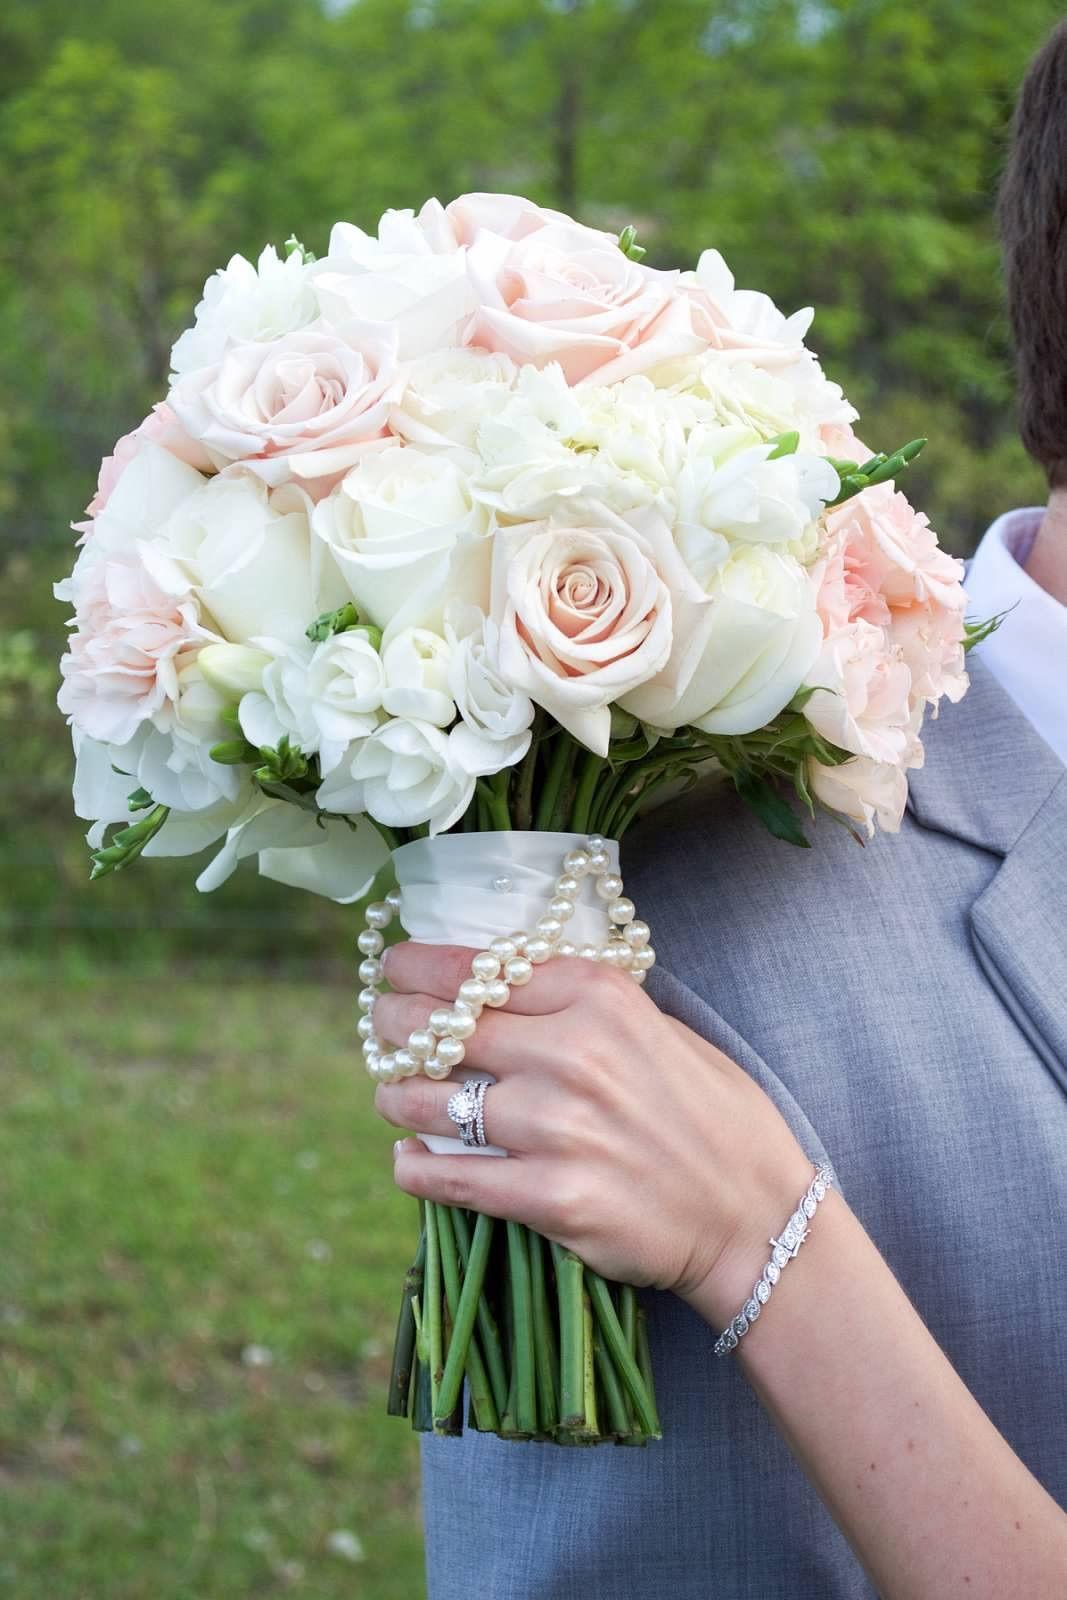 Spring Wedding Blush Pink And Cream Bouquet Bridal Soft Pale